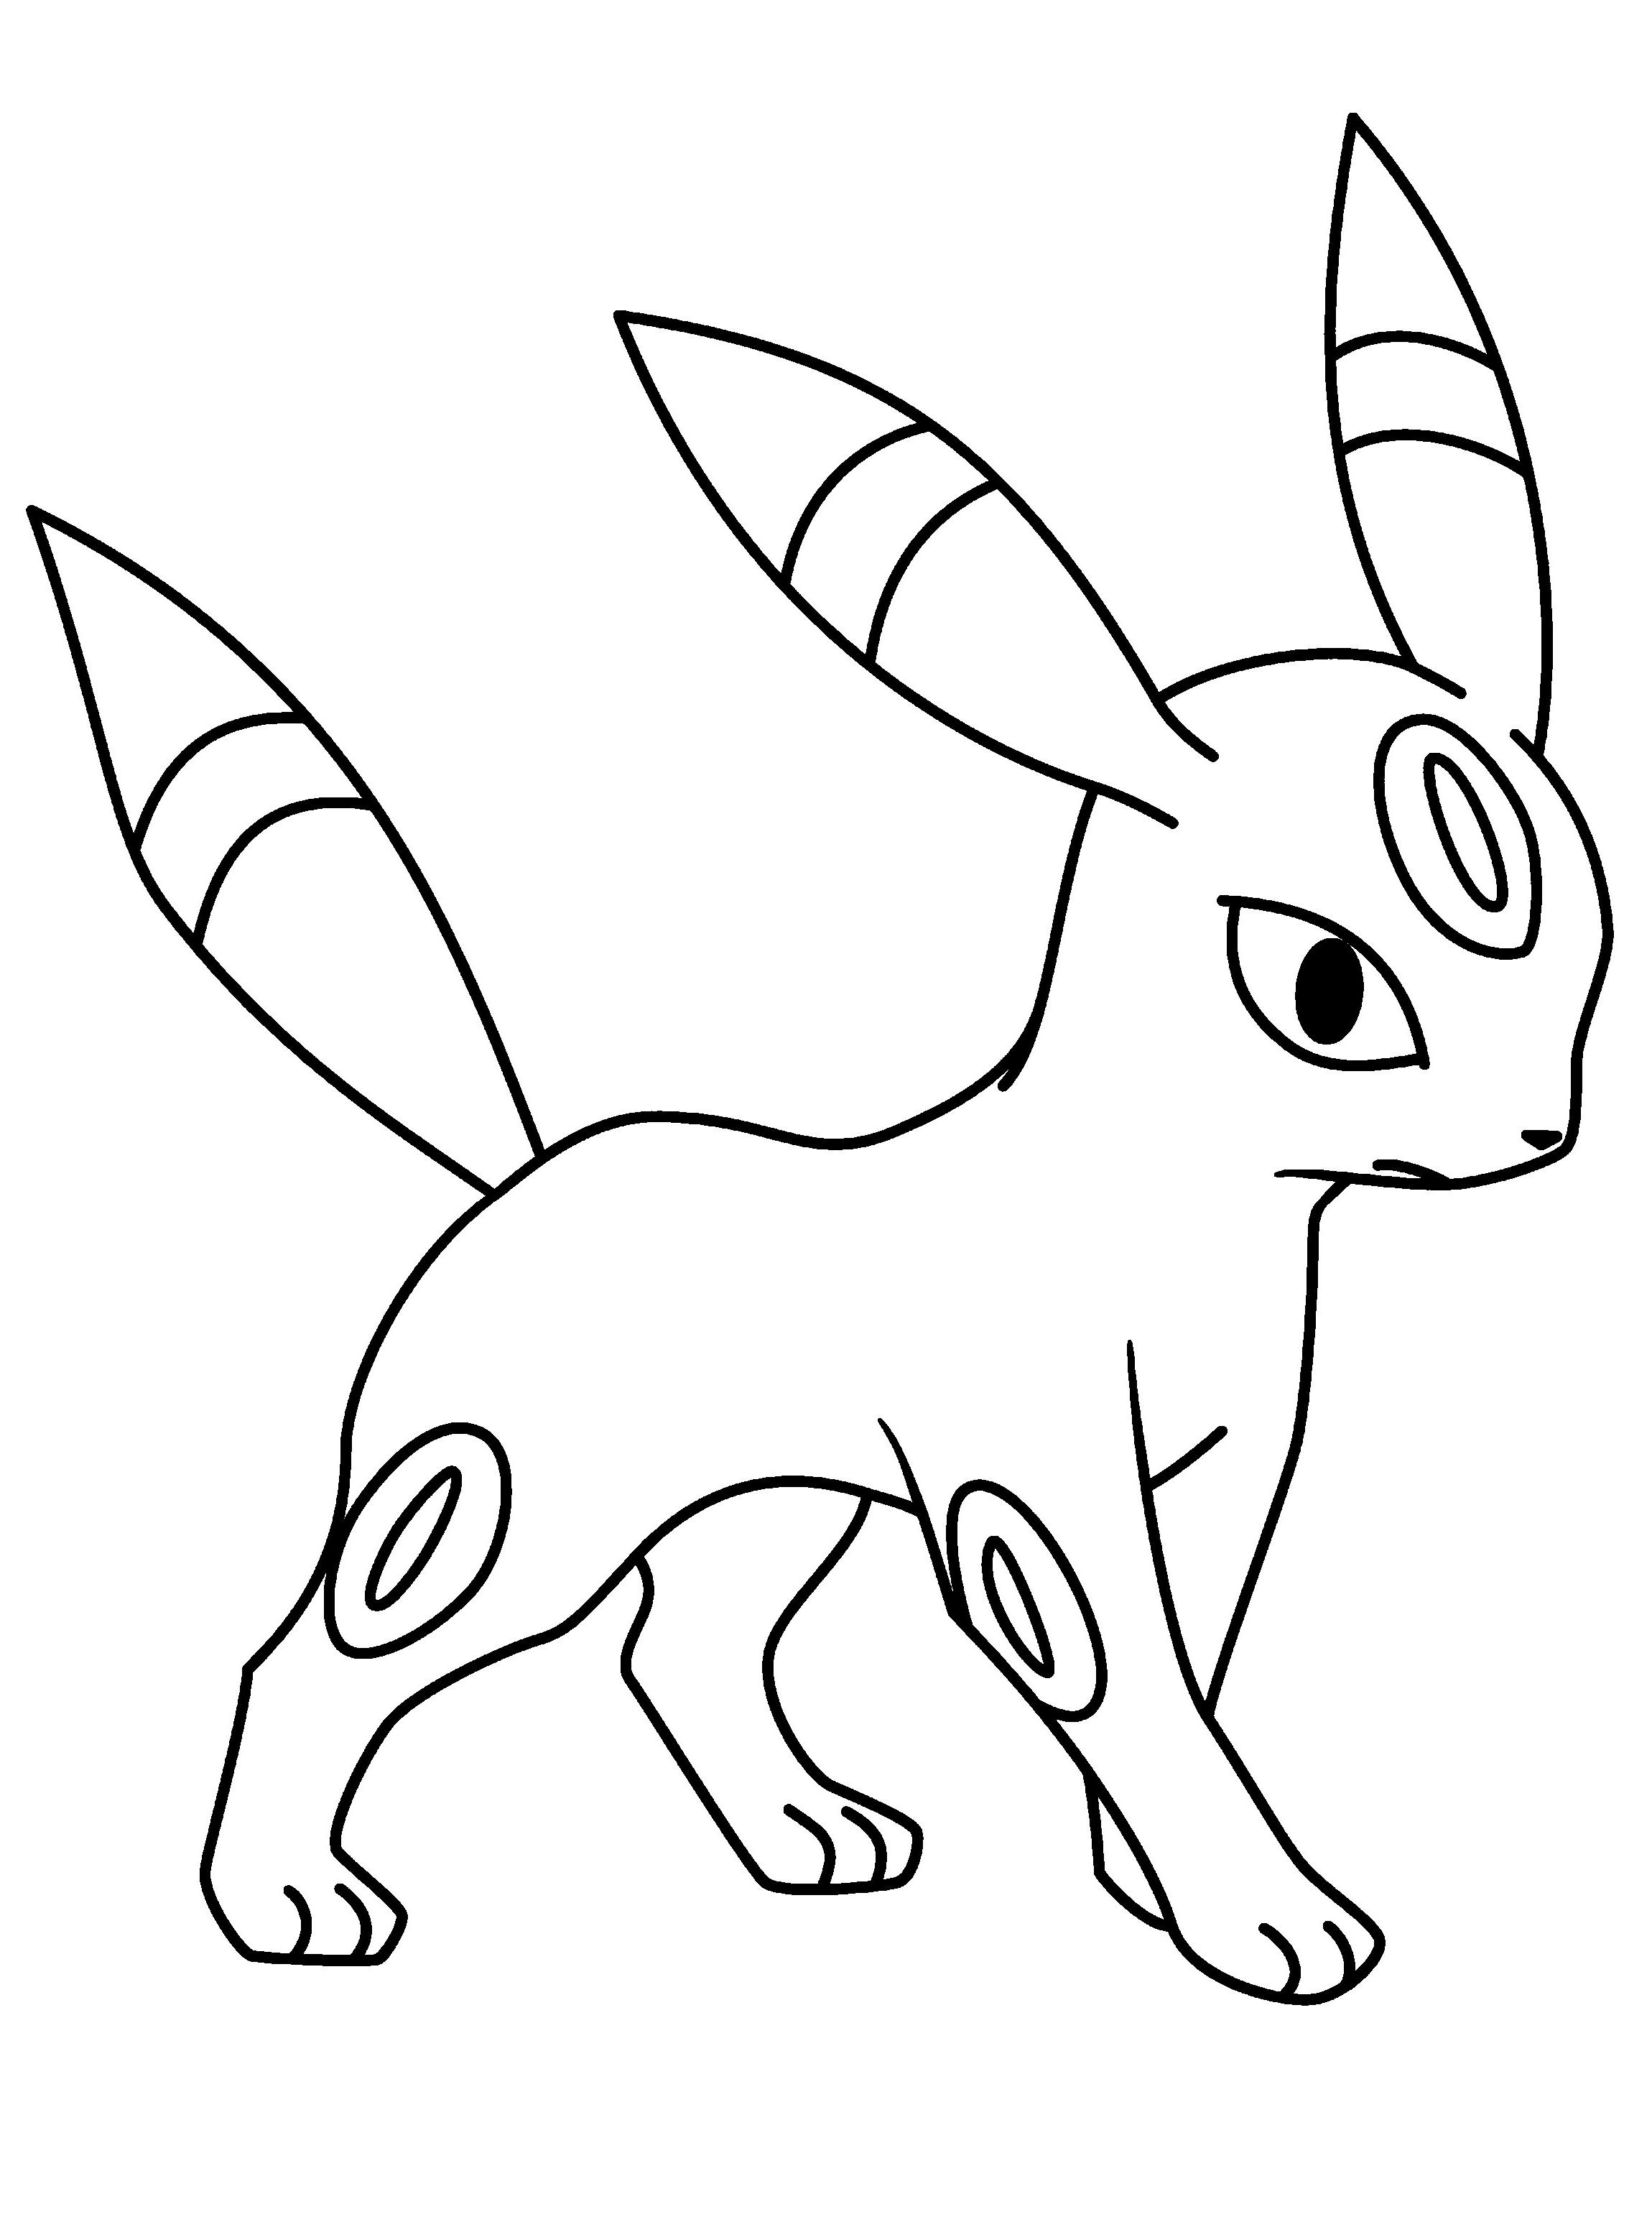 ▷ Dibujos de Pokémon para dibujar, colorear, pintar e imprimir